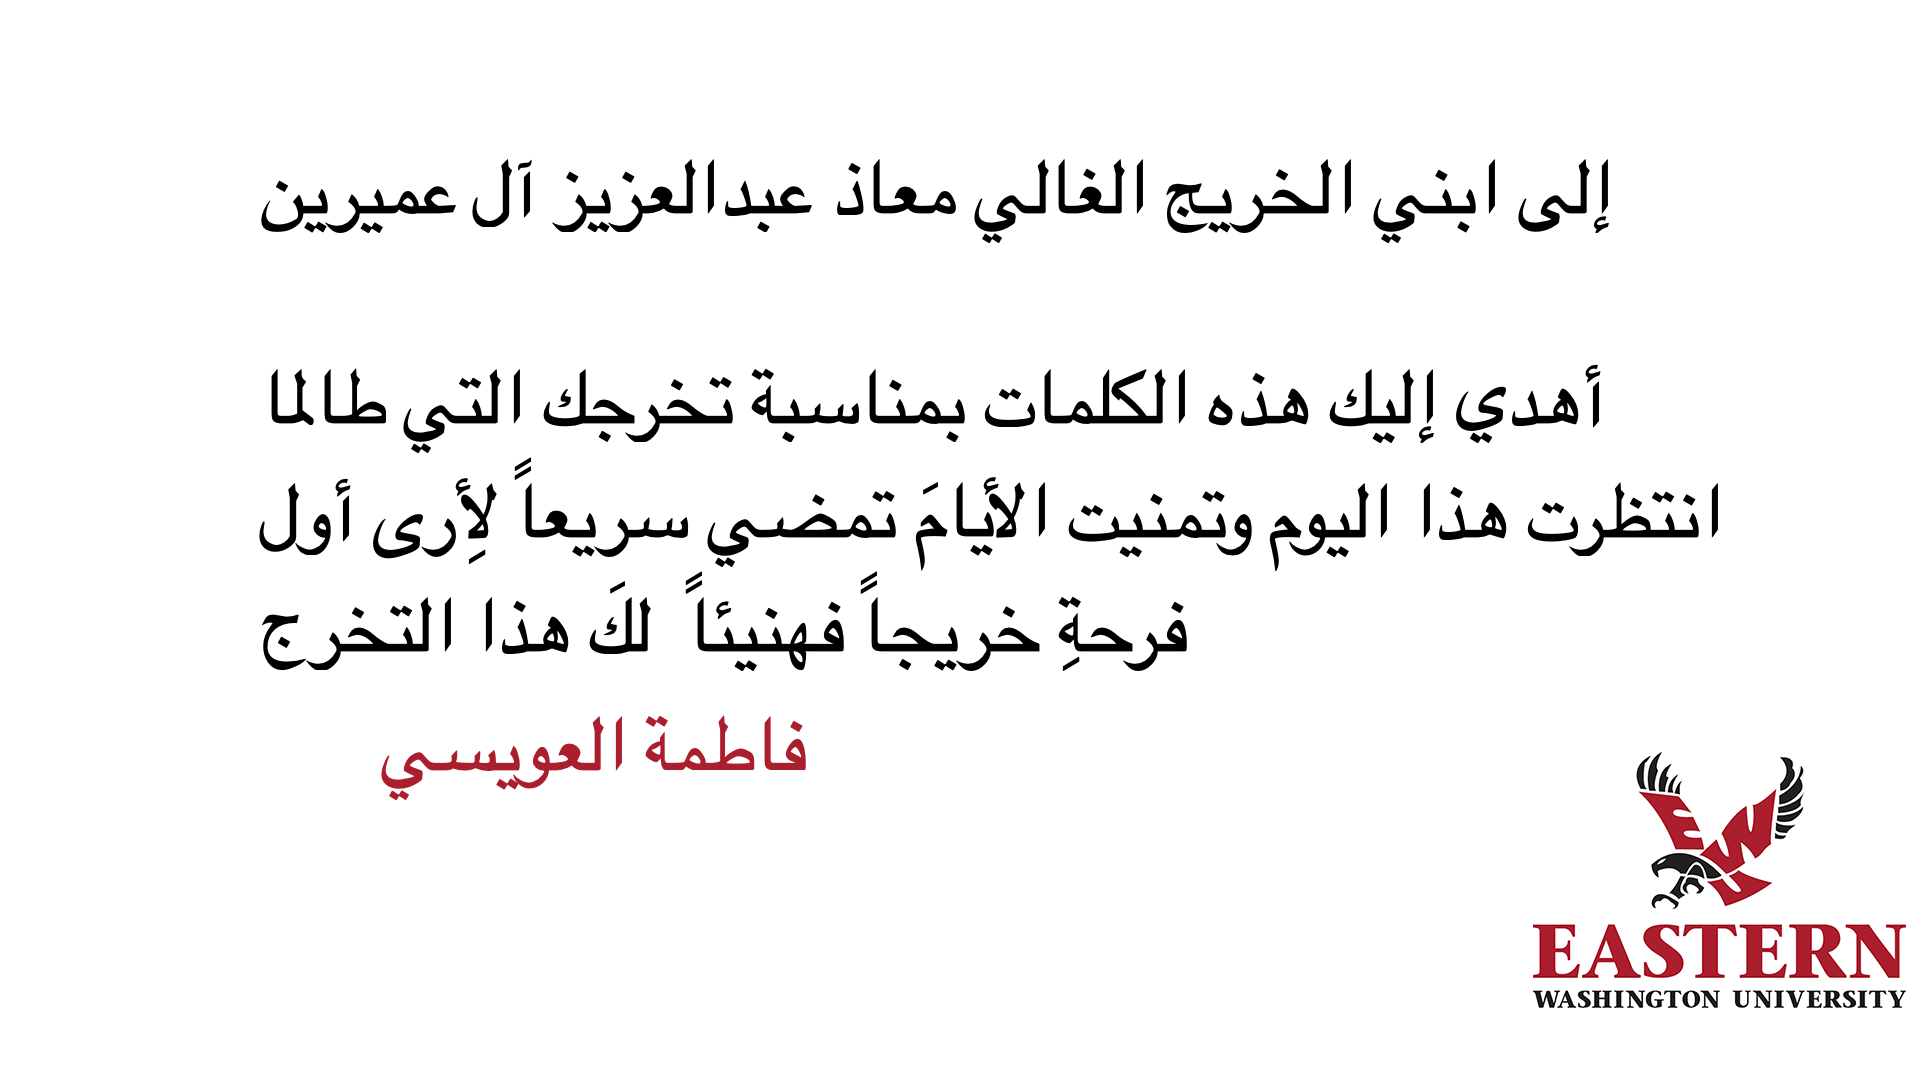 tbi_muath-abdulaziz-al-omayrin_1967.png